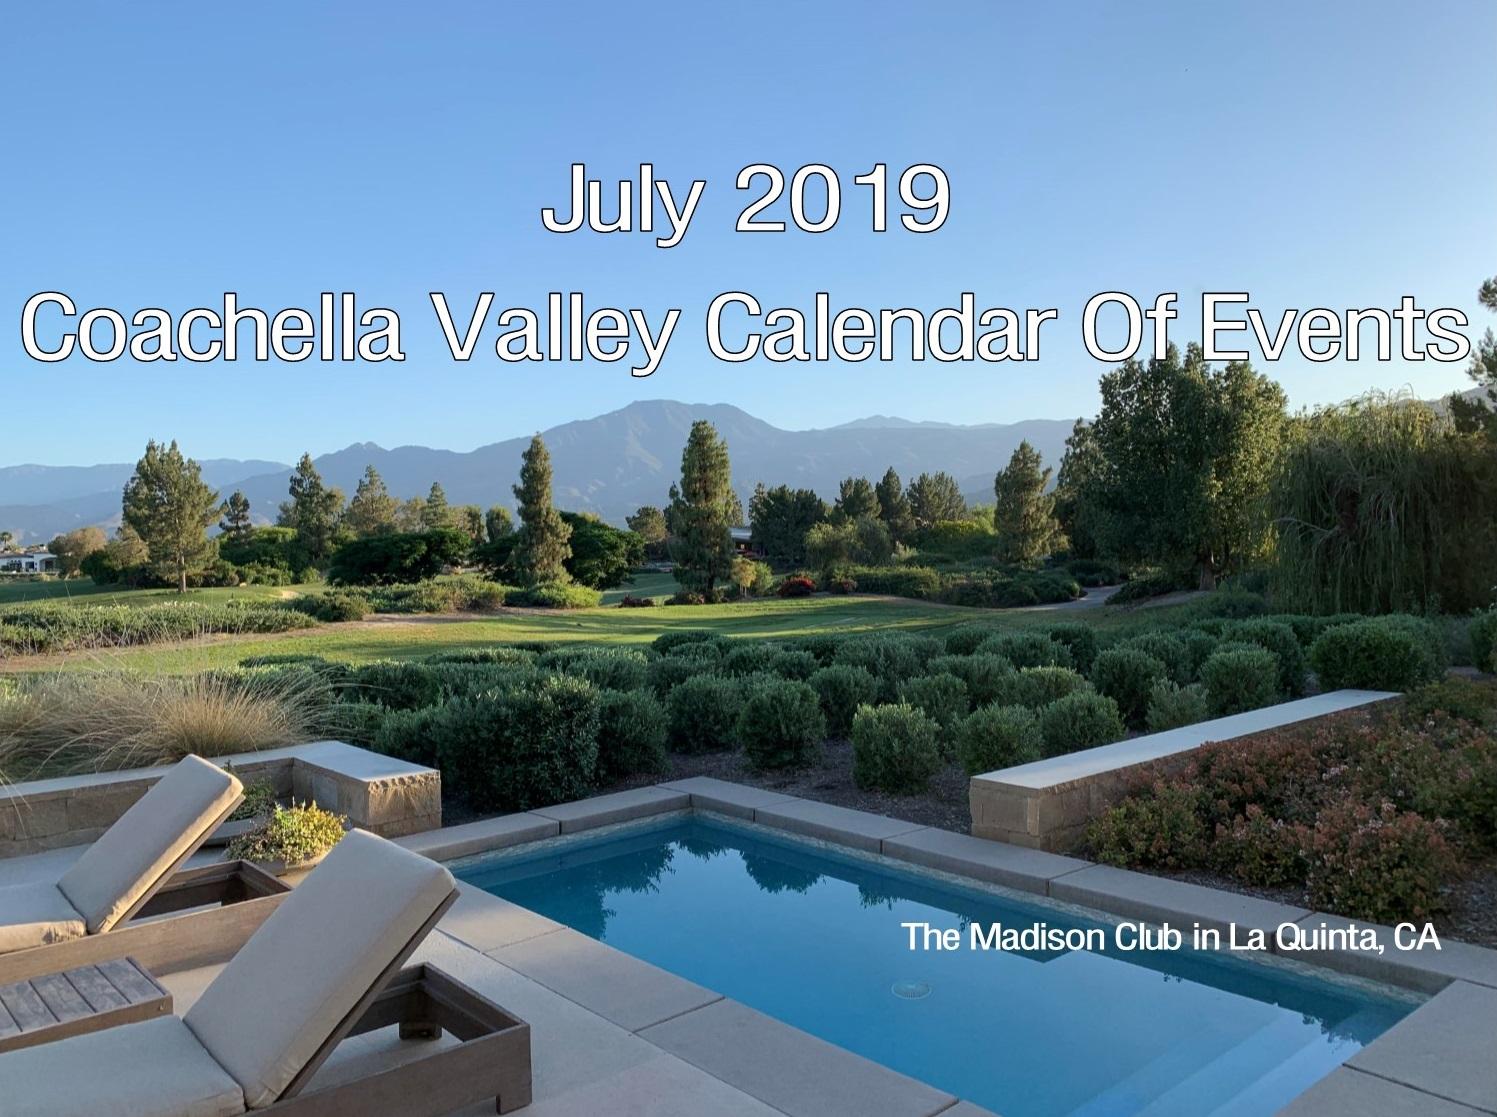 July 2019 Coachella Valley Calendar Of Events